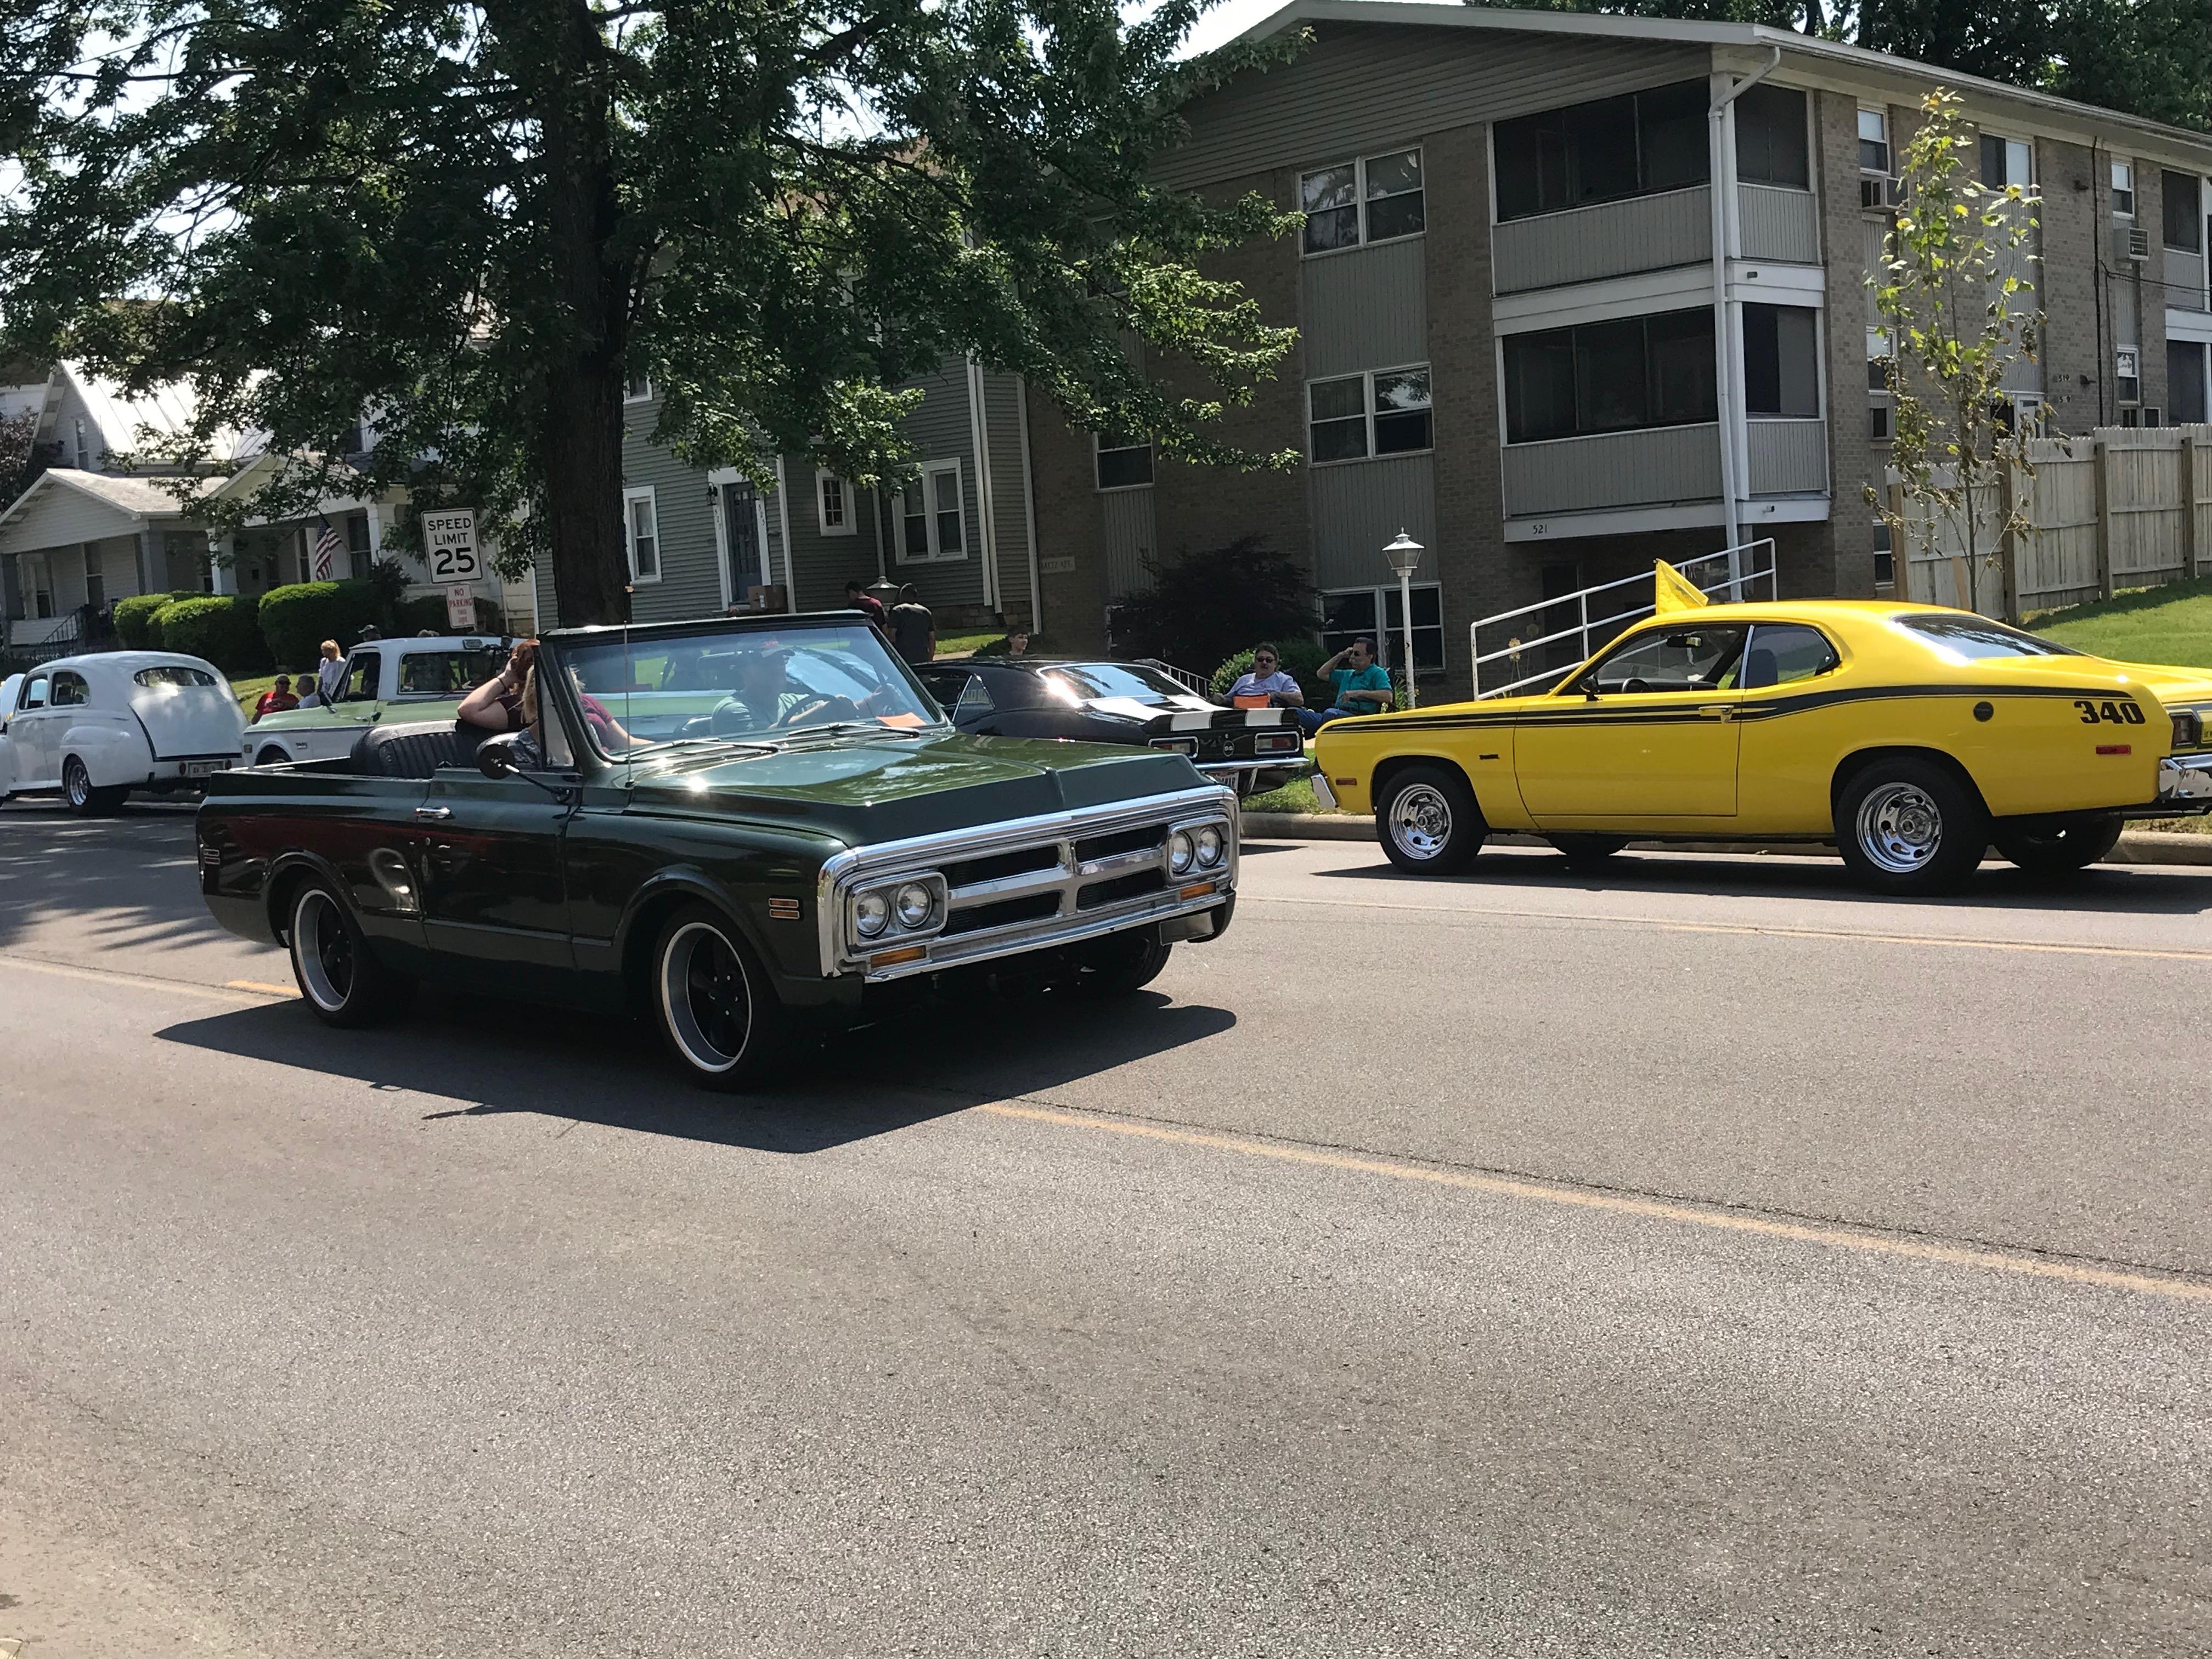 Car Show Considered Success Despite Rain Crawford County Now - Car shows near me now